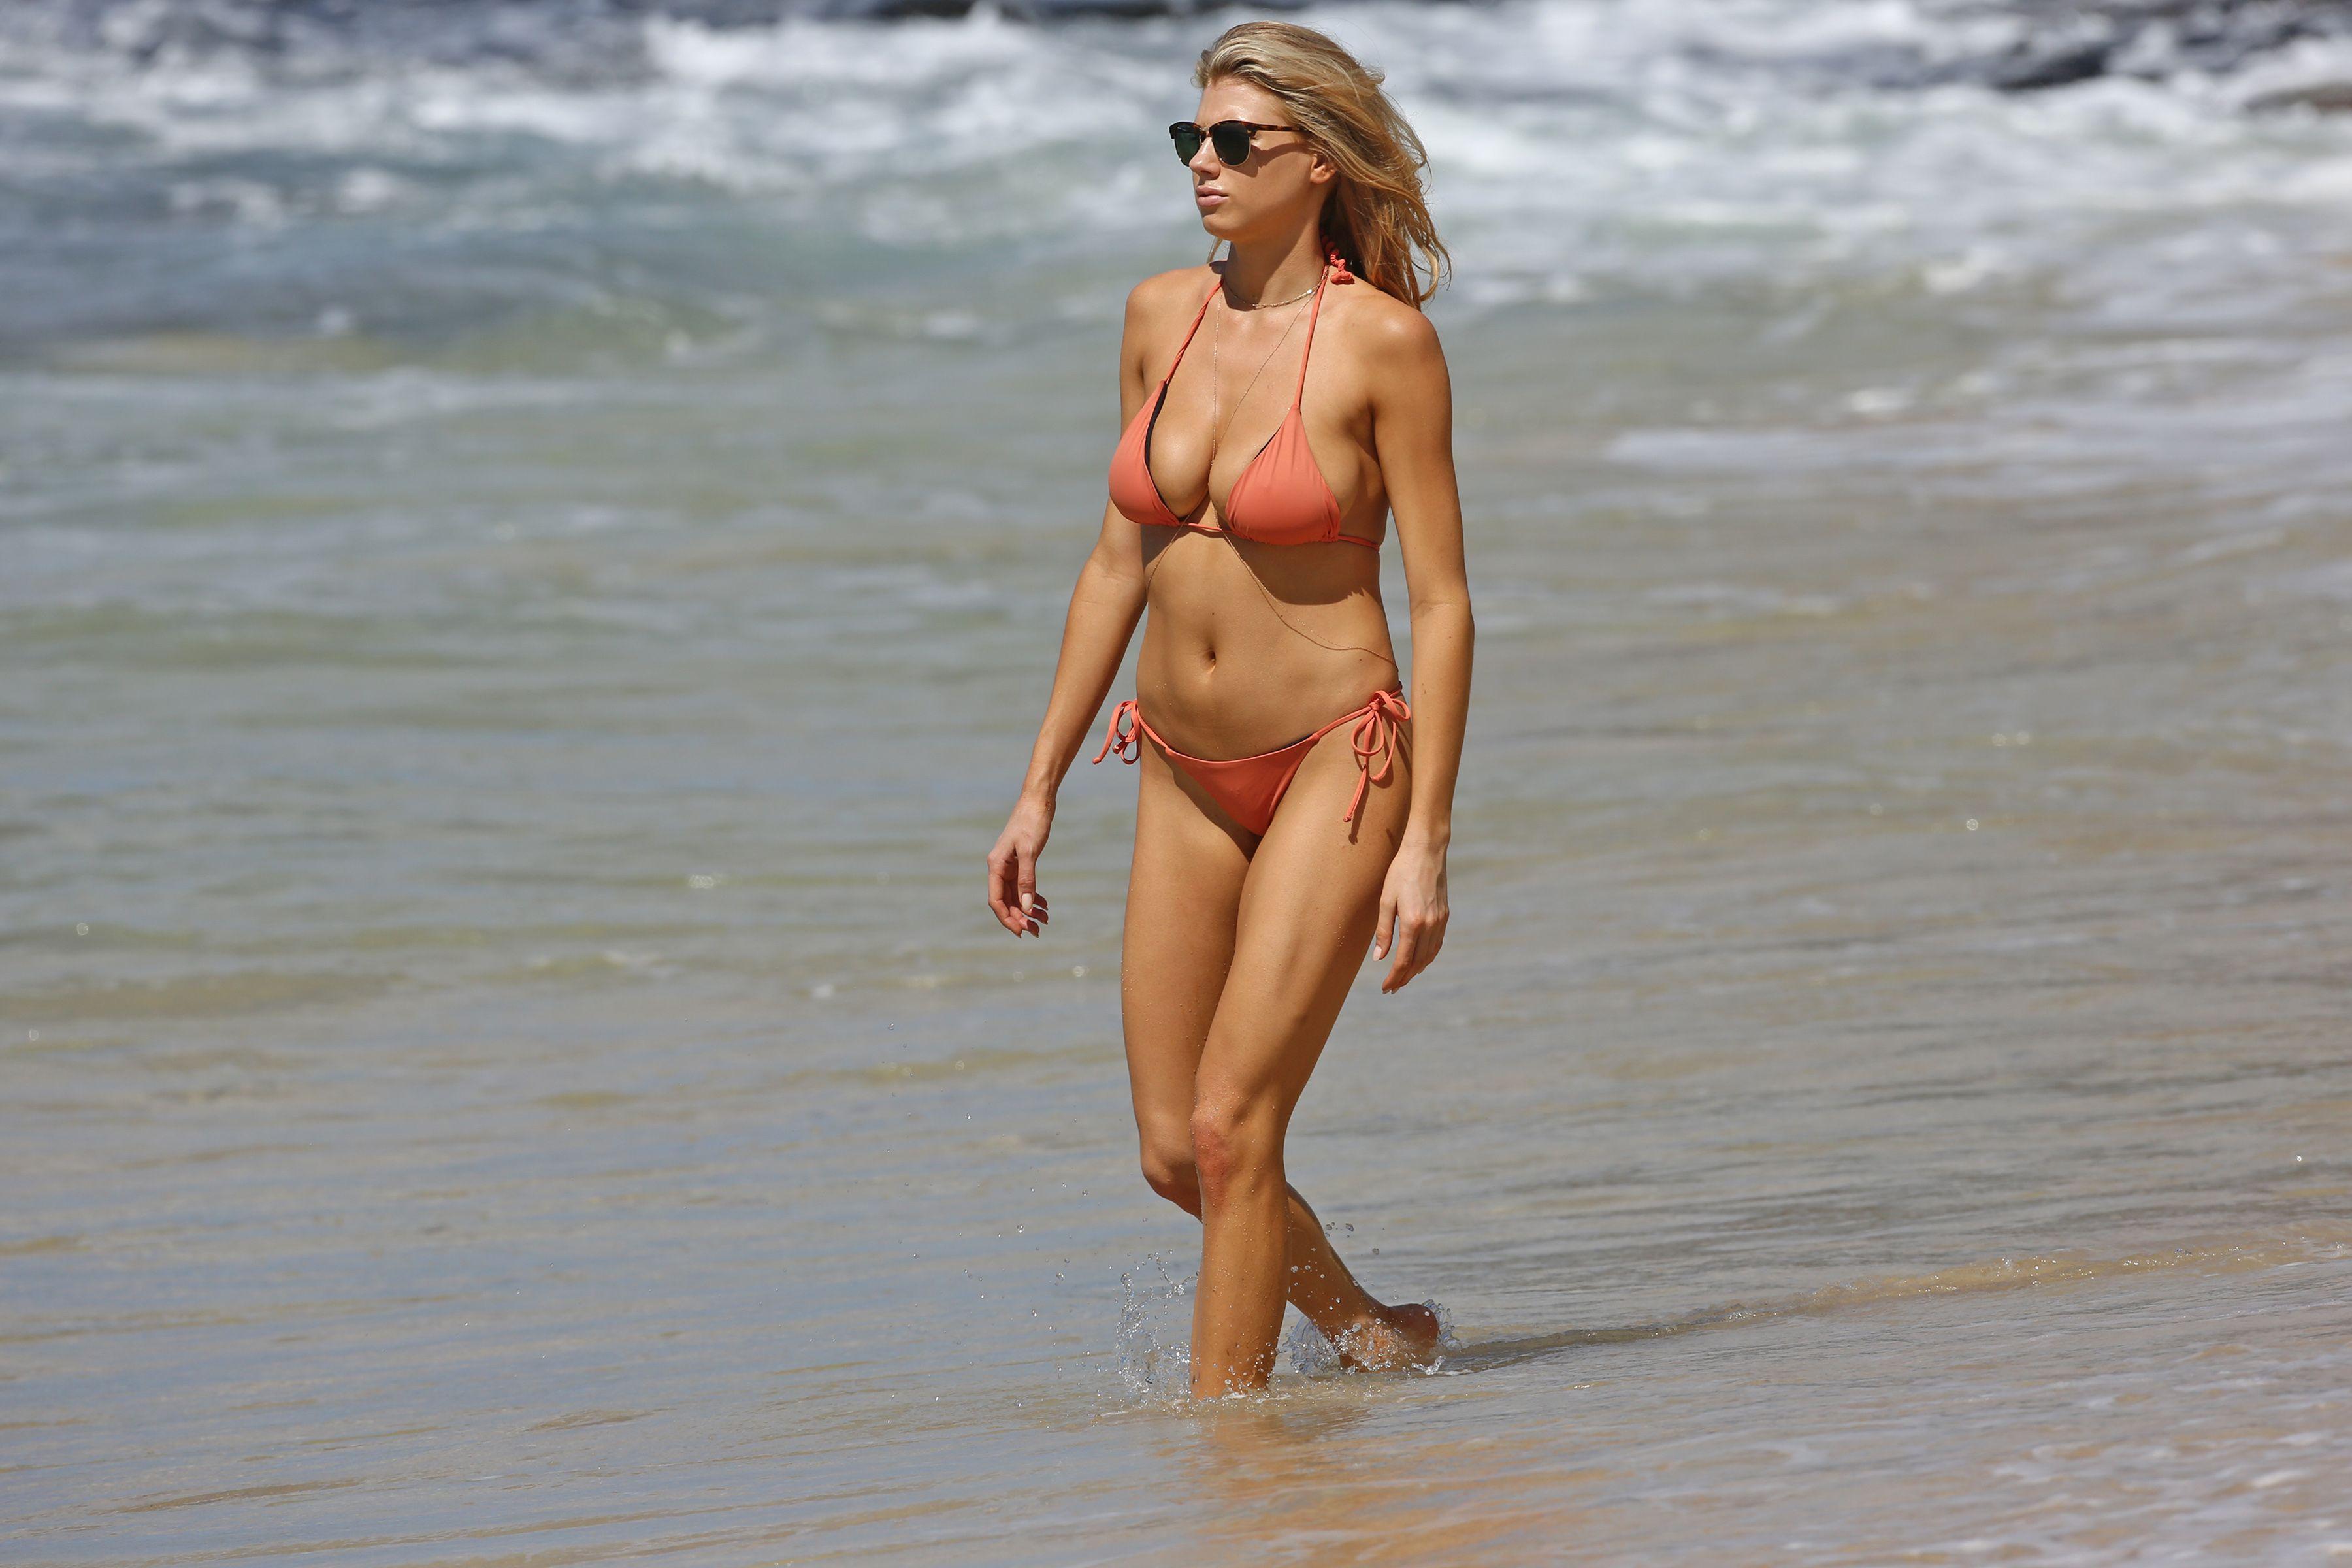 charlotte-mckinney-bikini-thefappening-so-0002